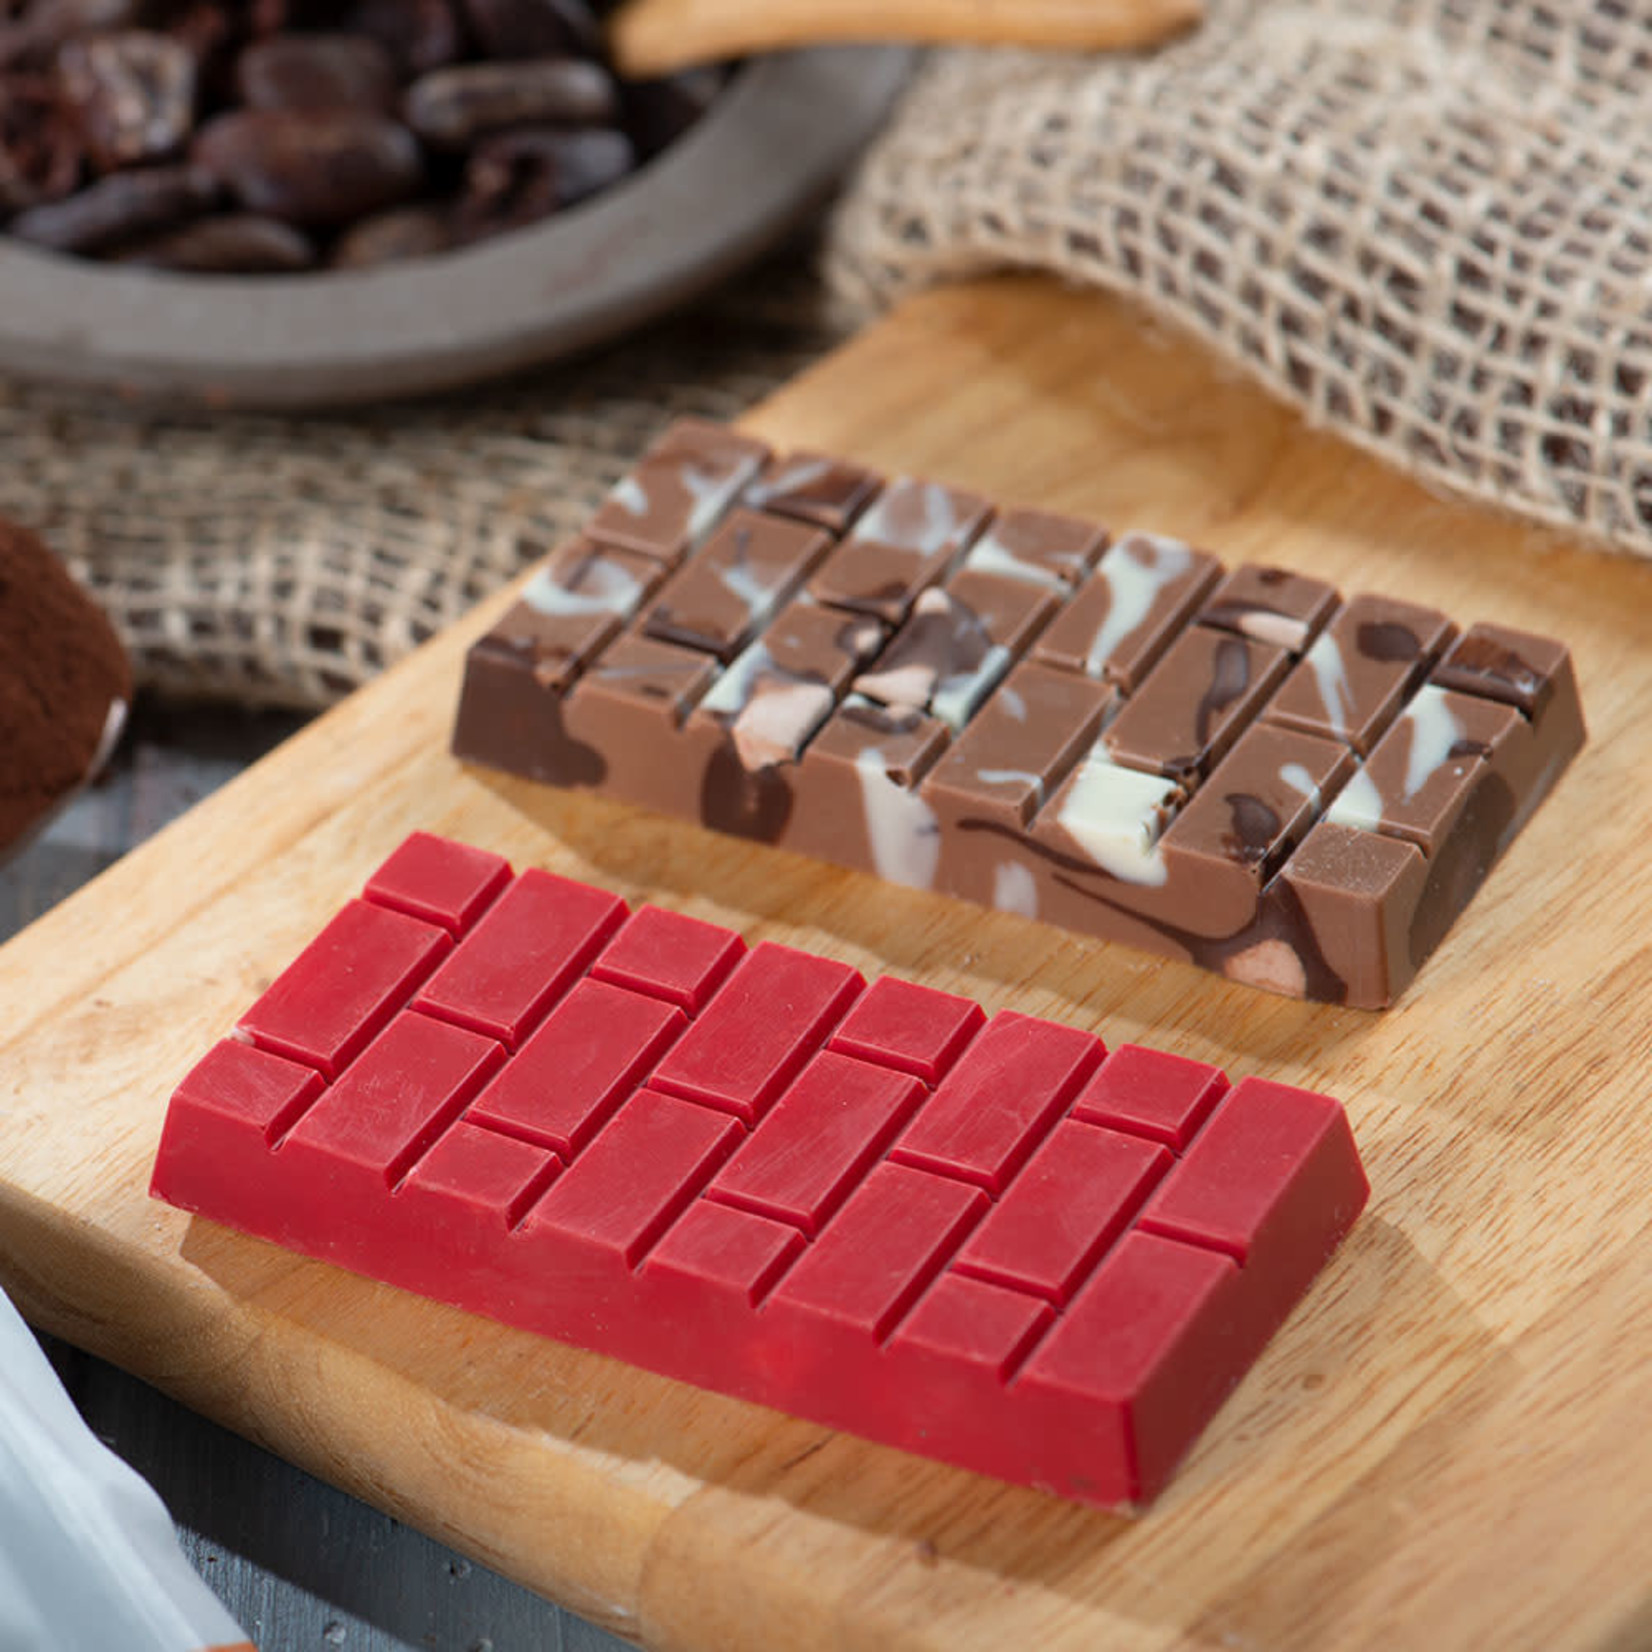 Decora Chocoladevorm polycarbonaat bakstenen